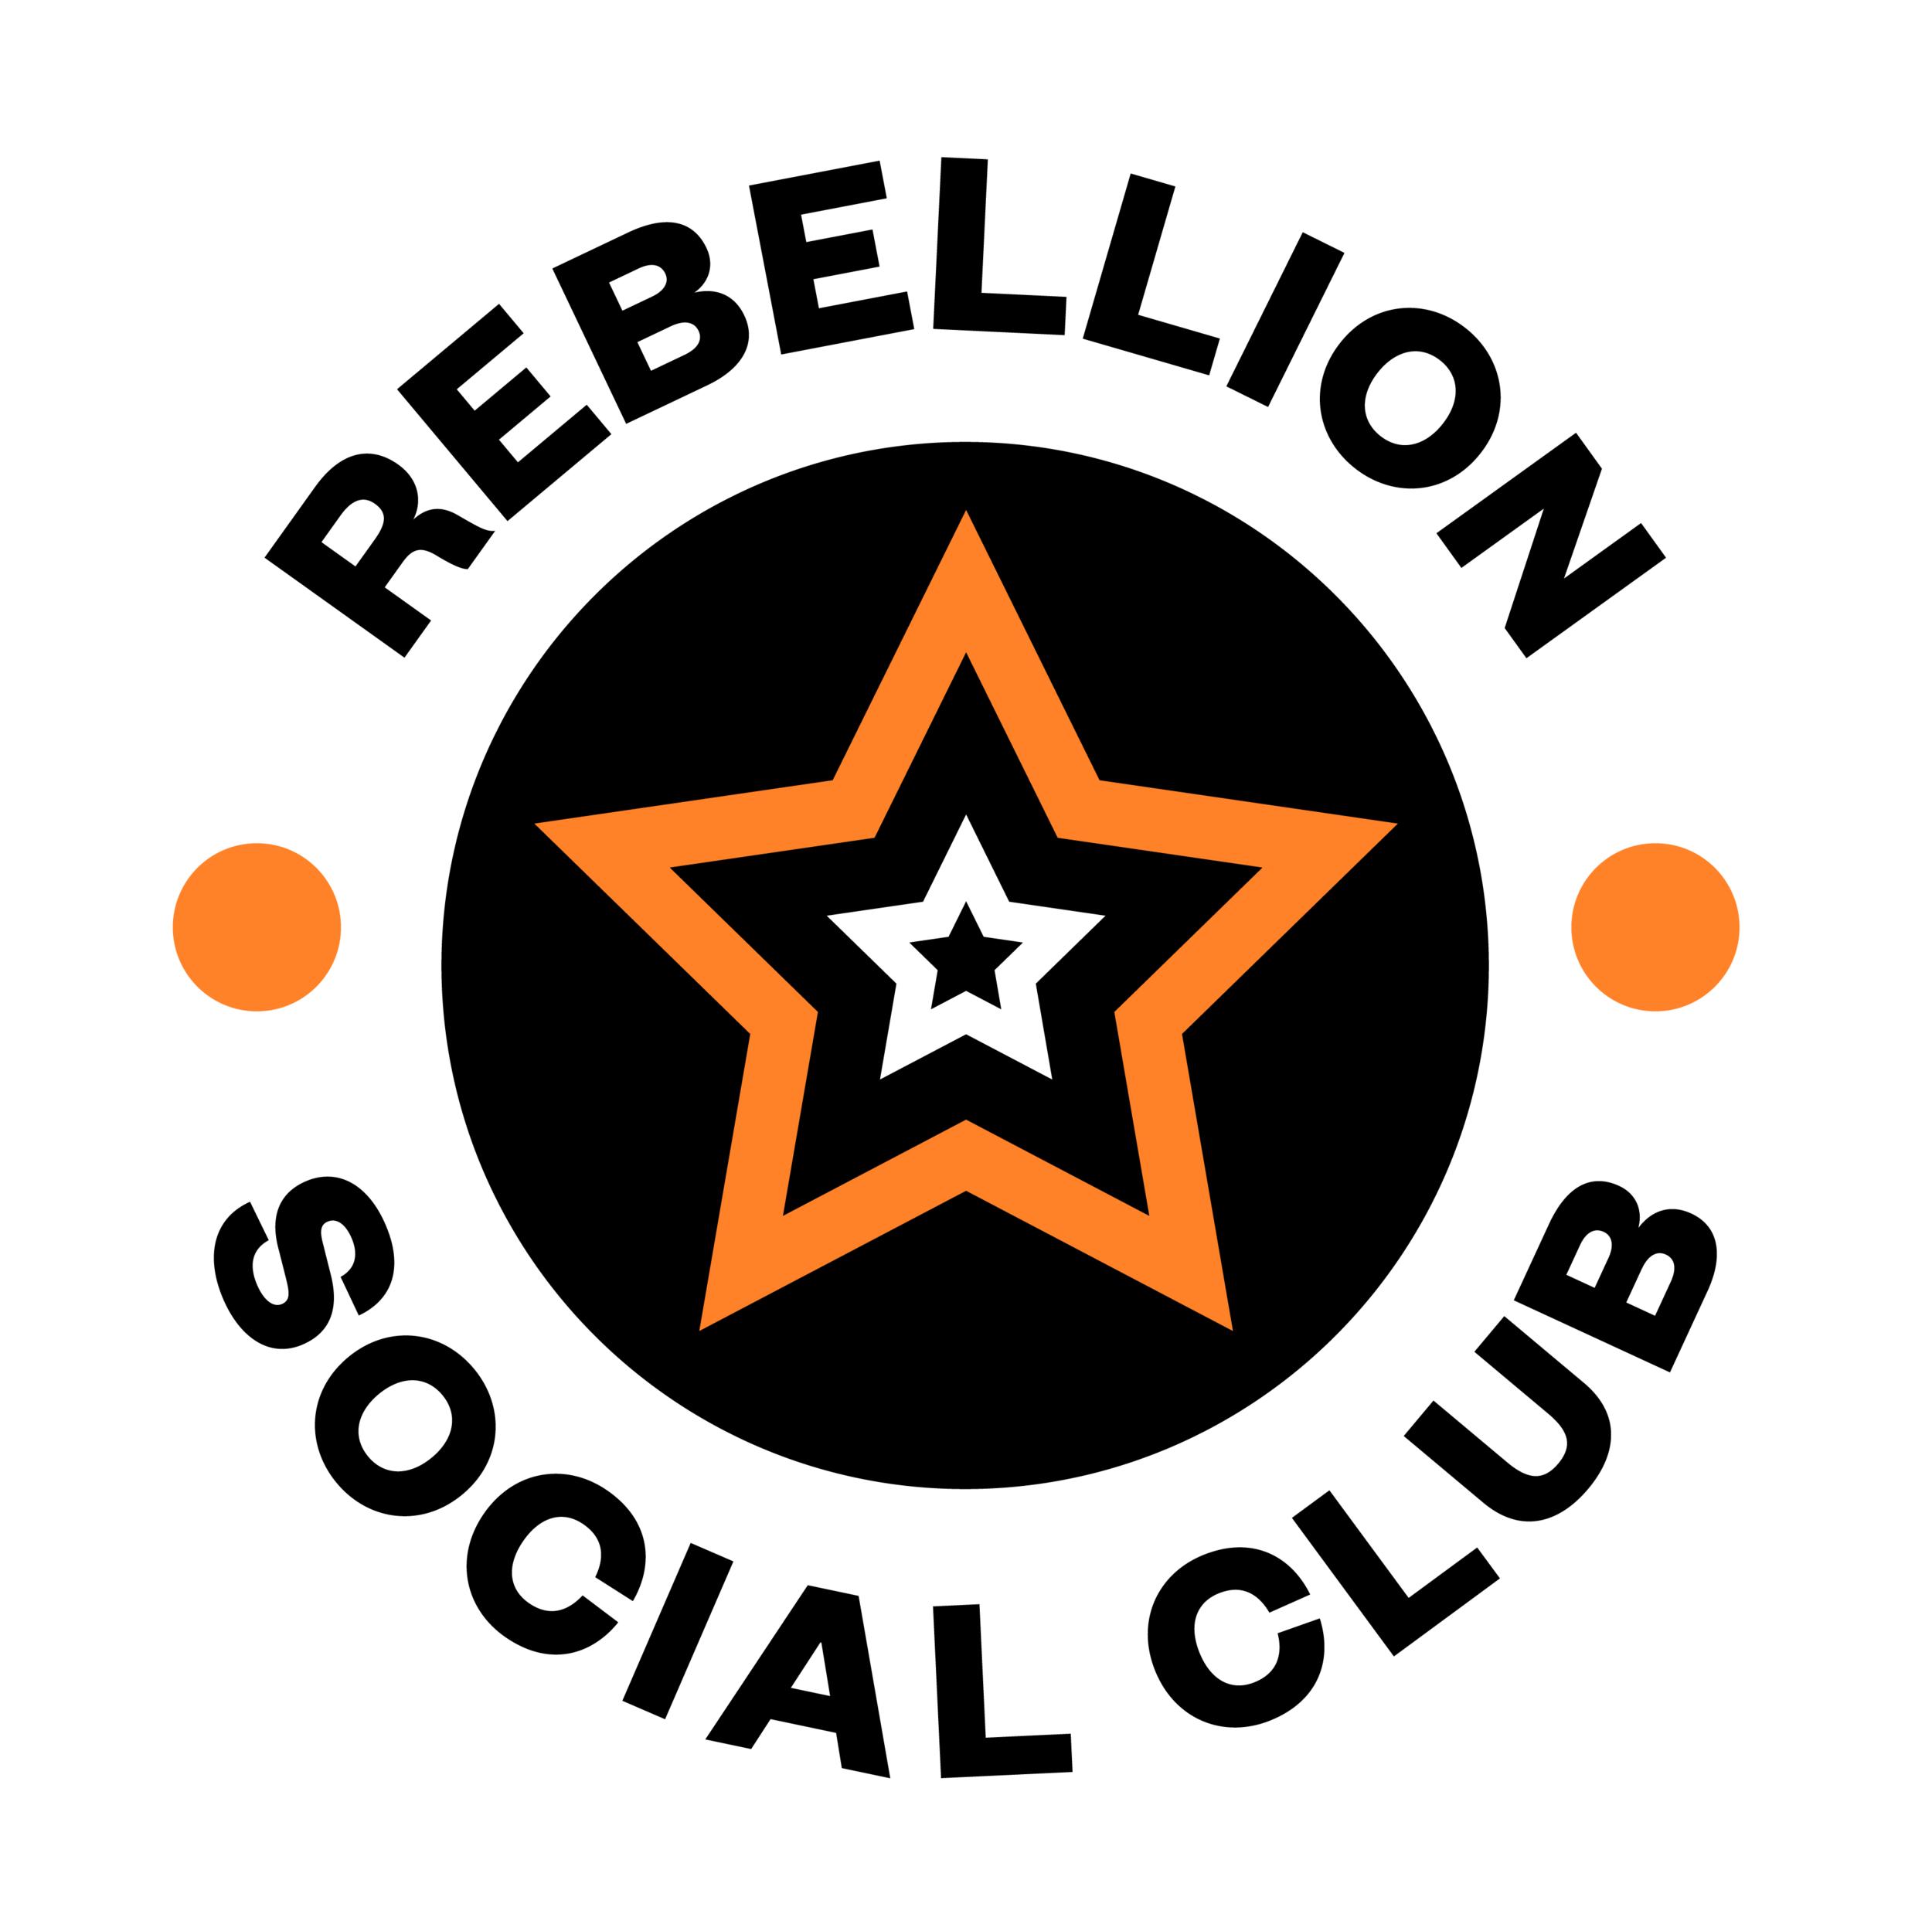 Rebellion Social Club@4x.png